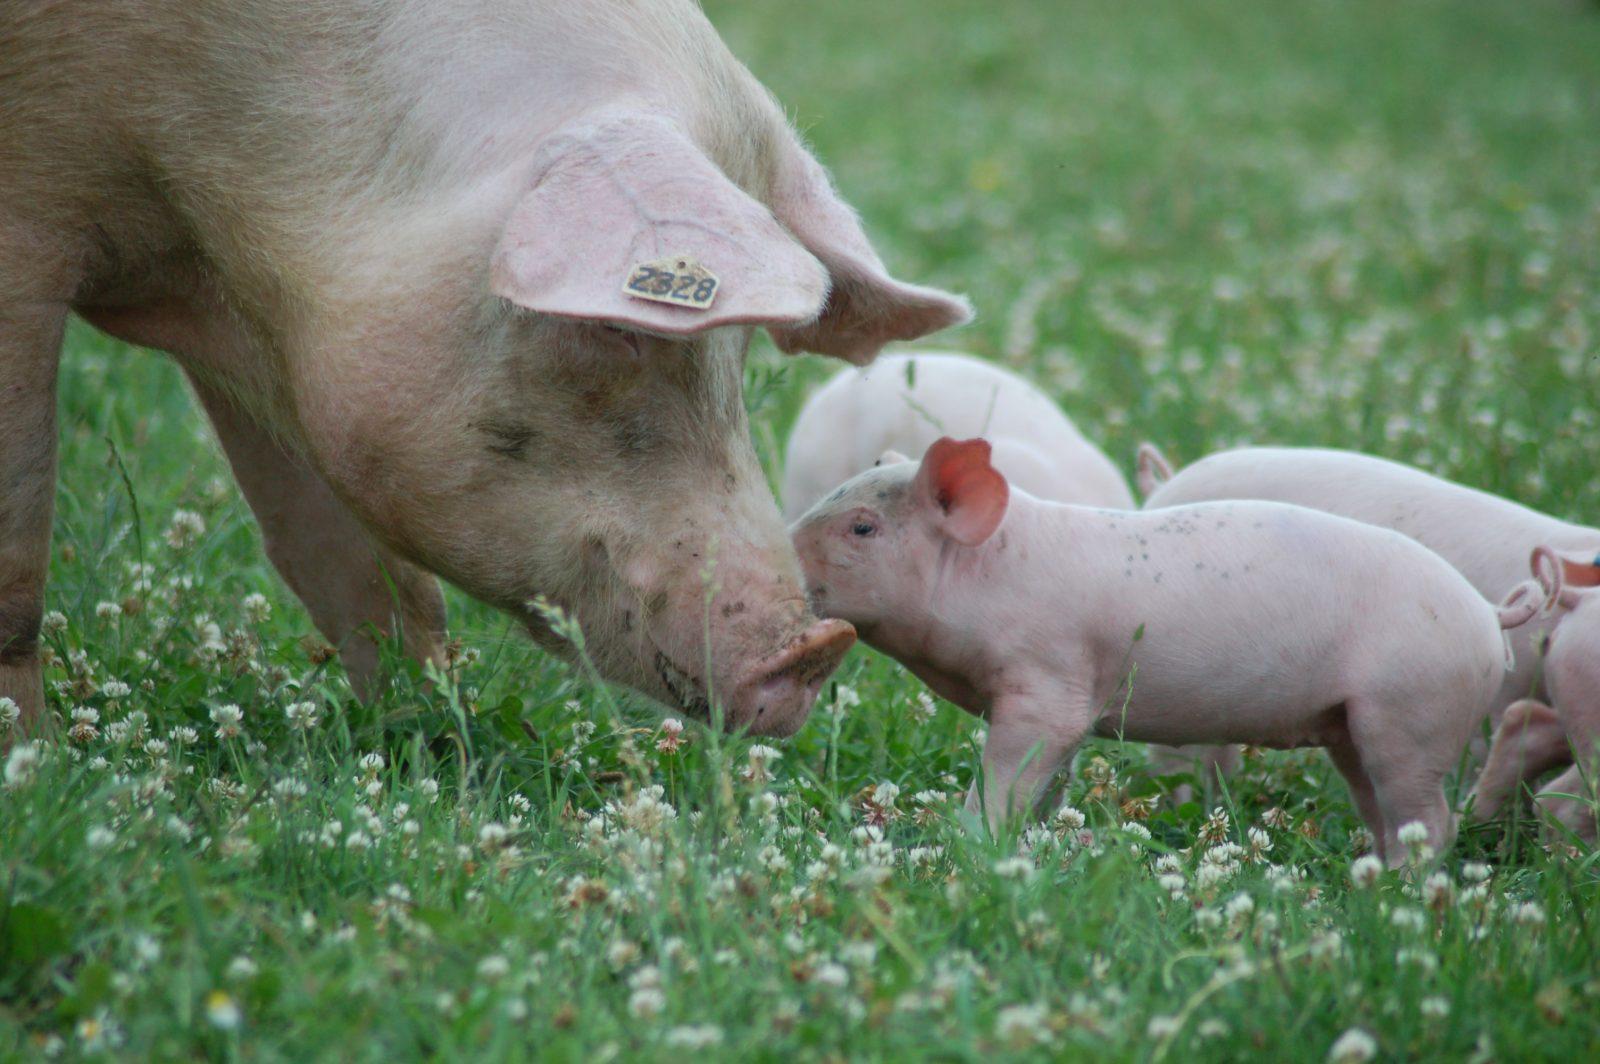 Nikki and piglets at Farm Sanctuary